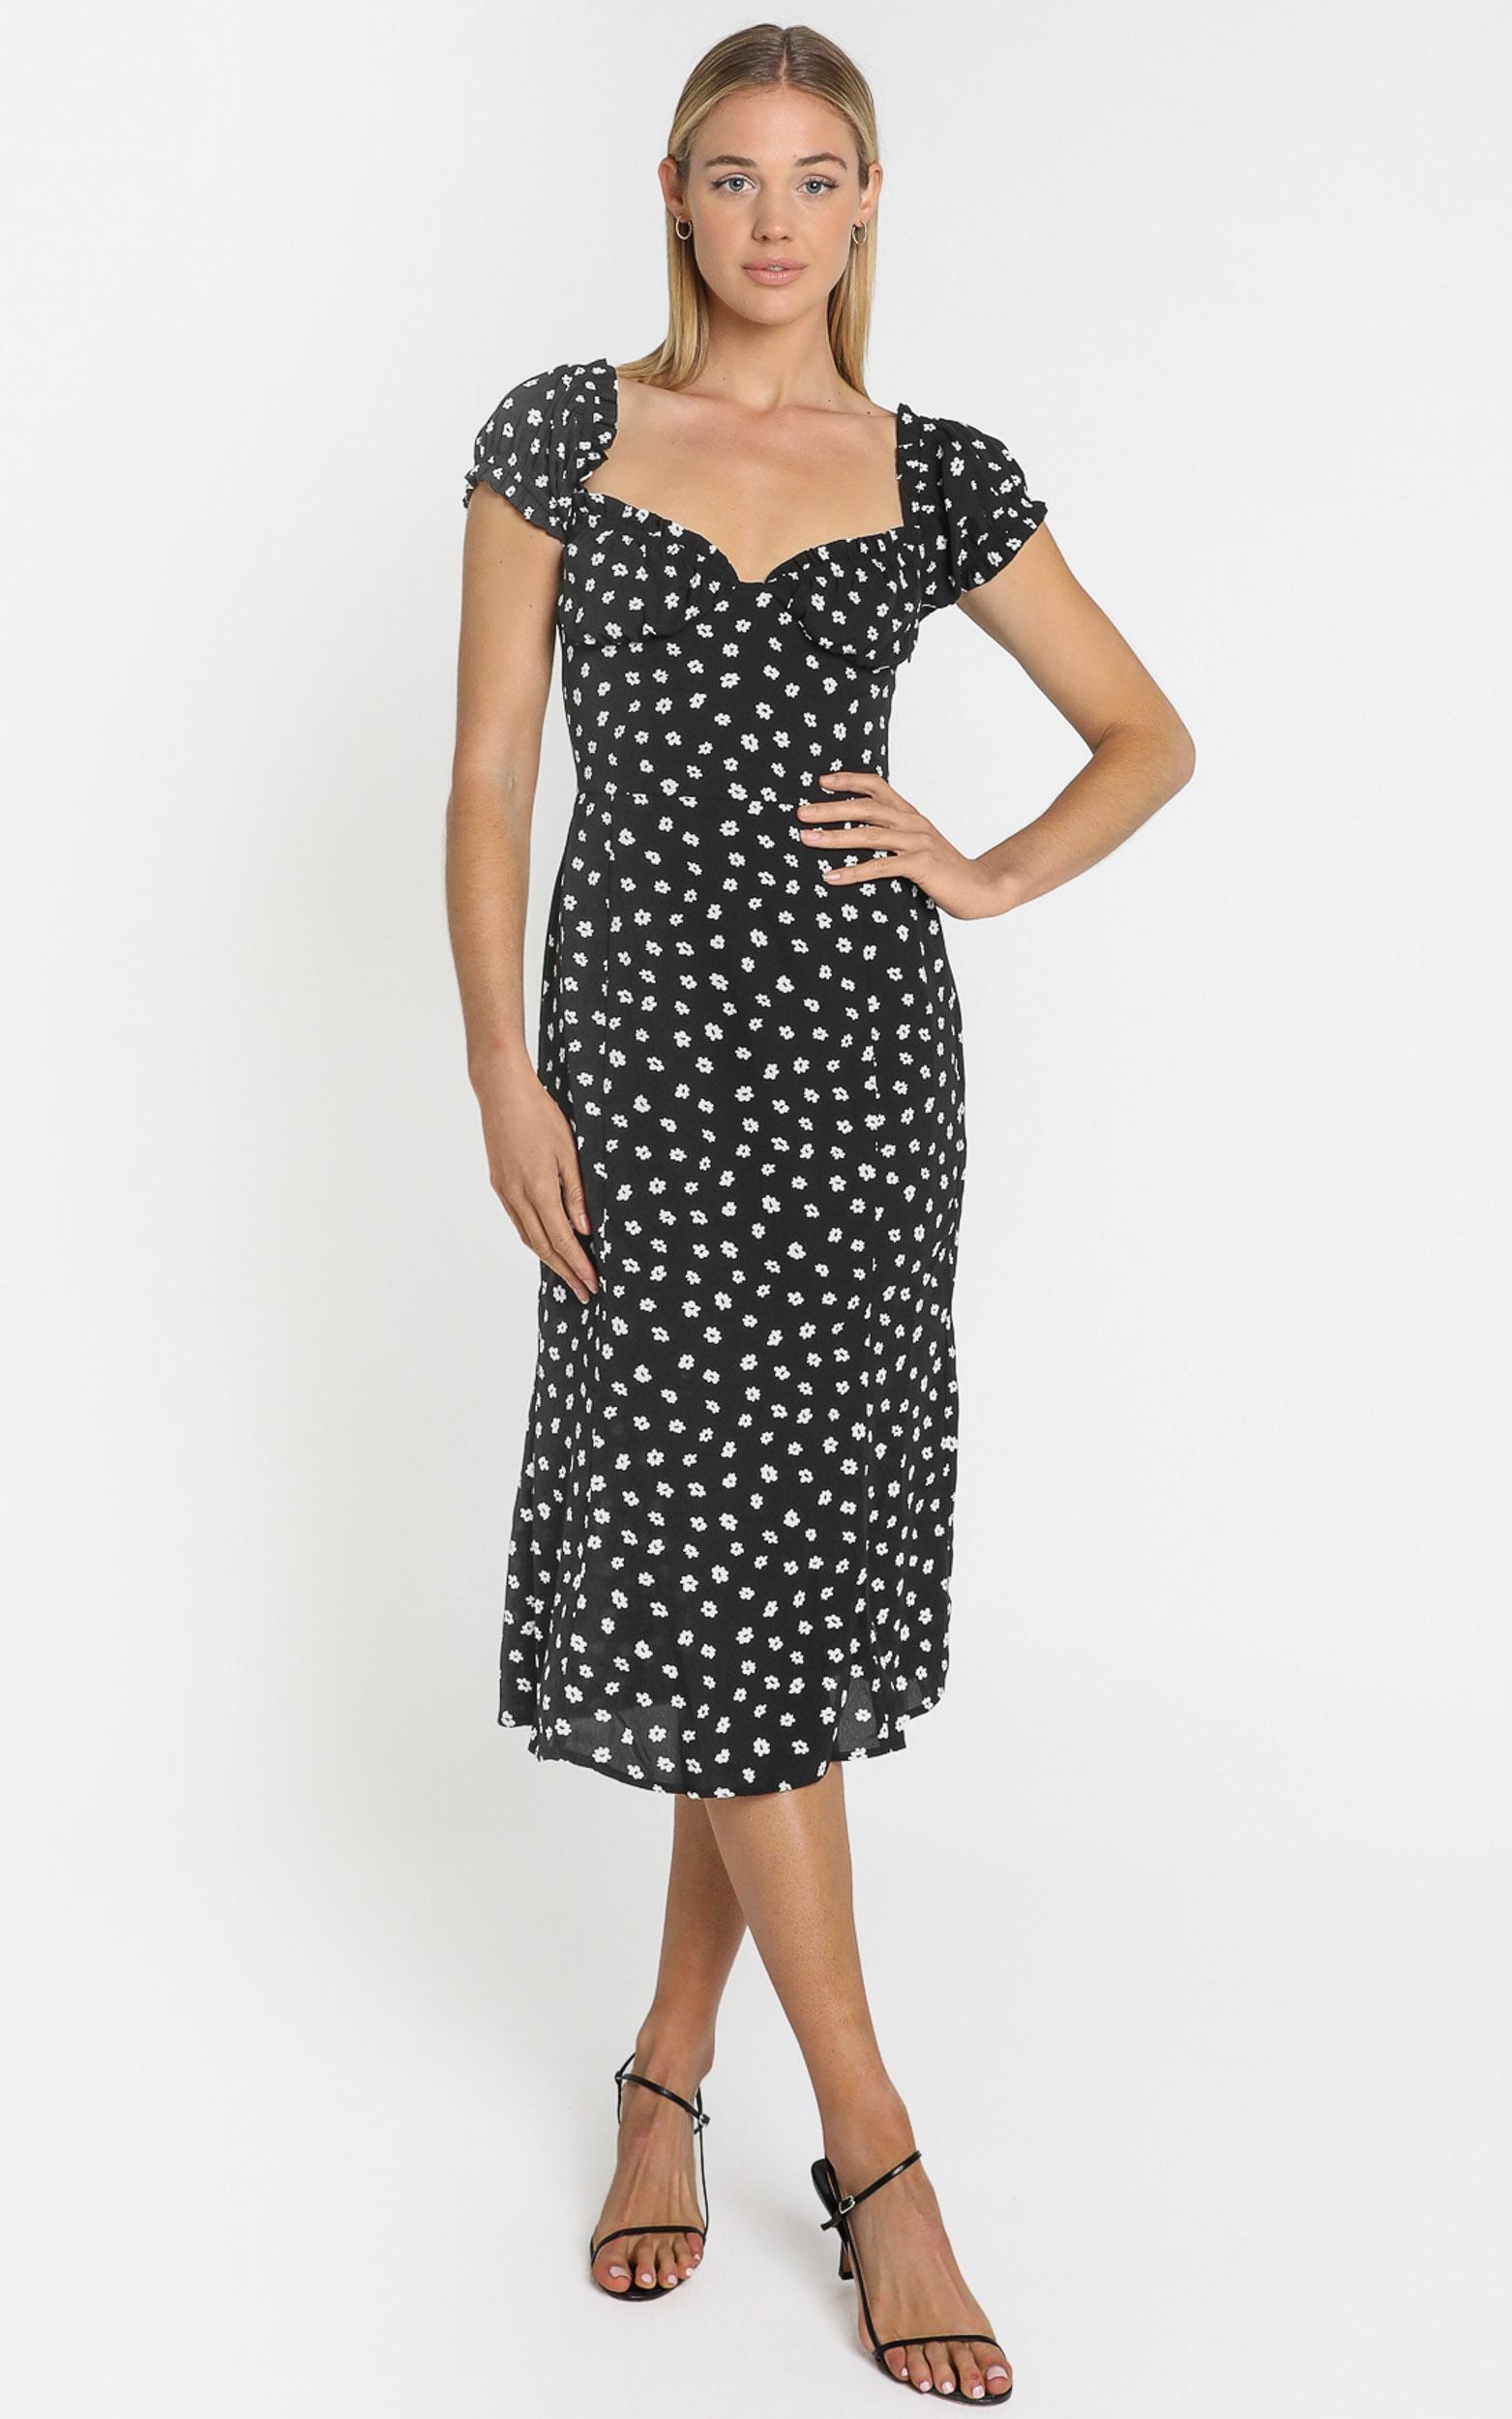 Lulu & Rose - Nova Midi Dress in Floral - 4 (XXS), Black, hi-res image number null